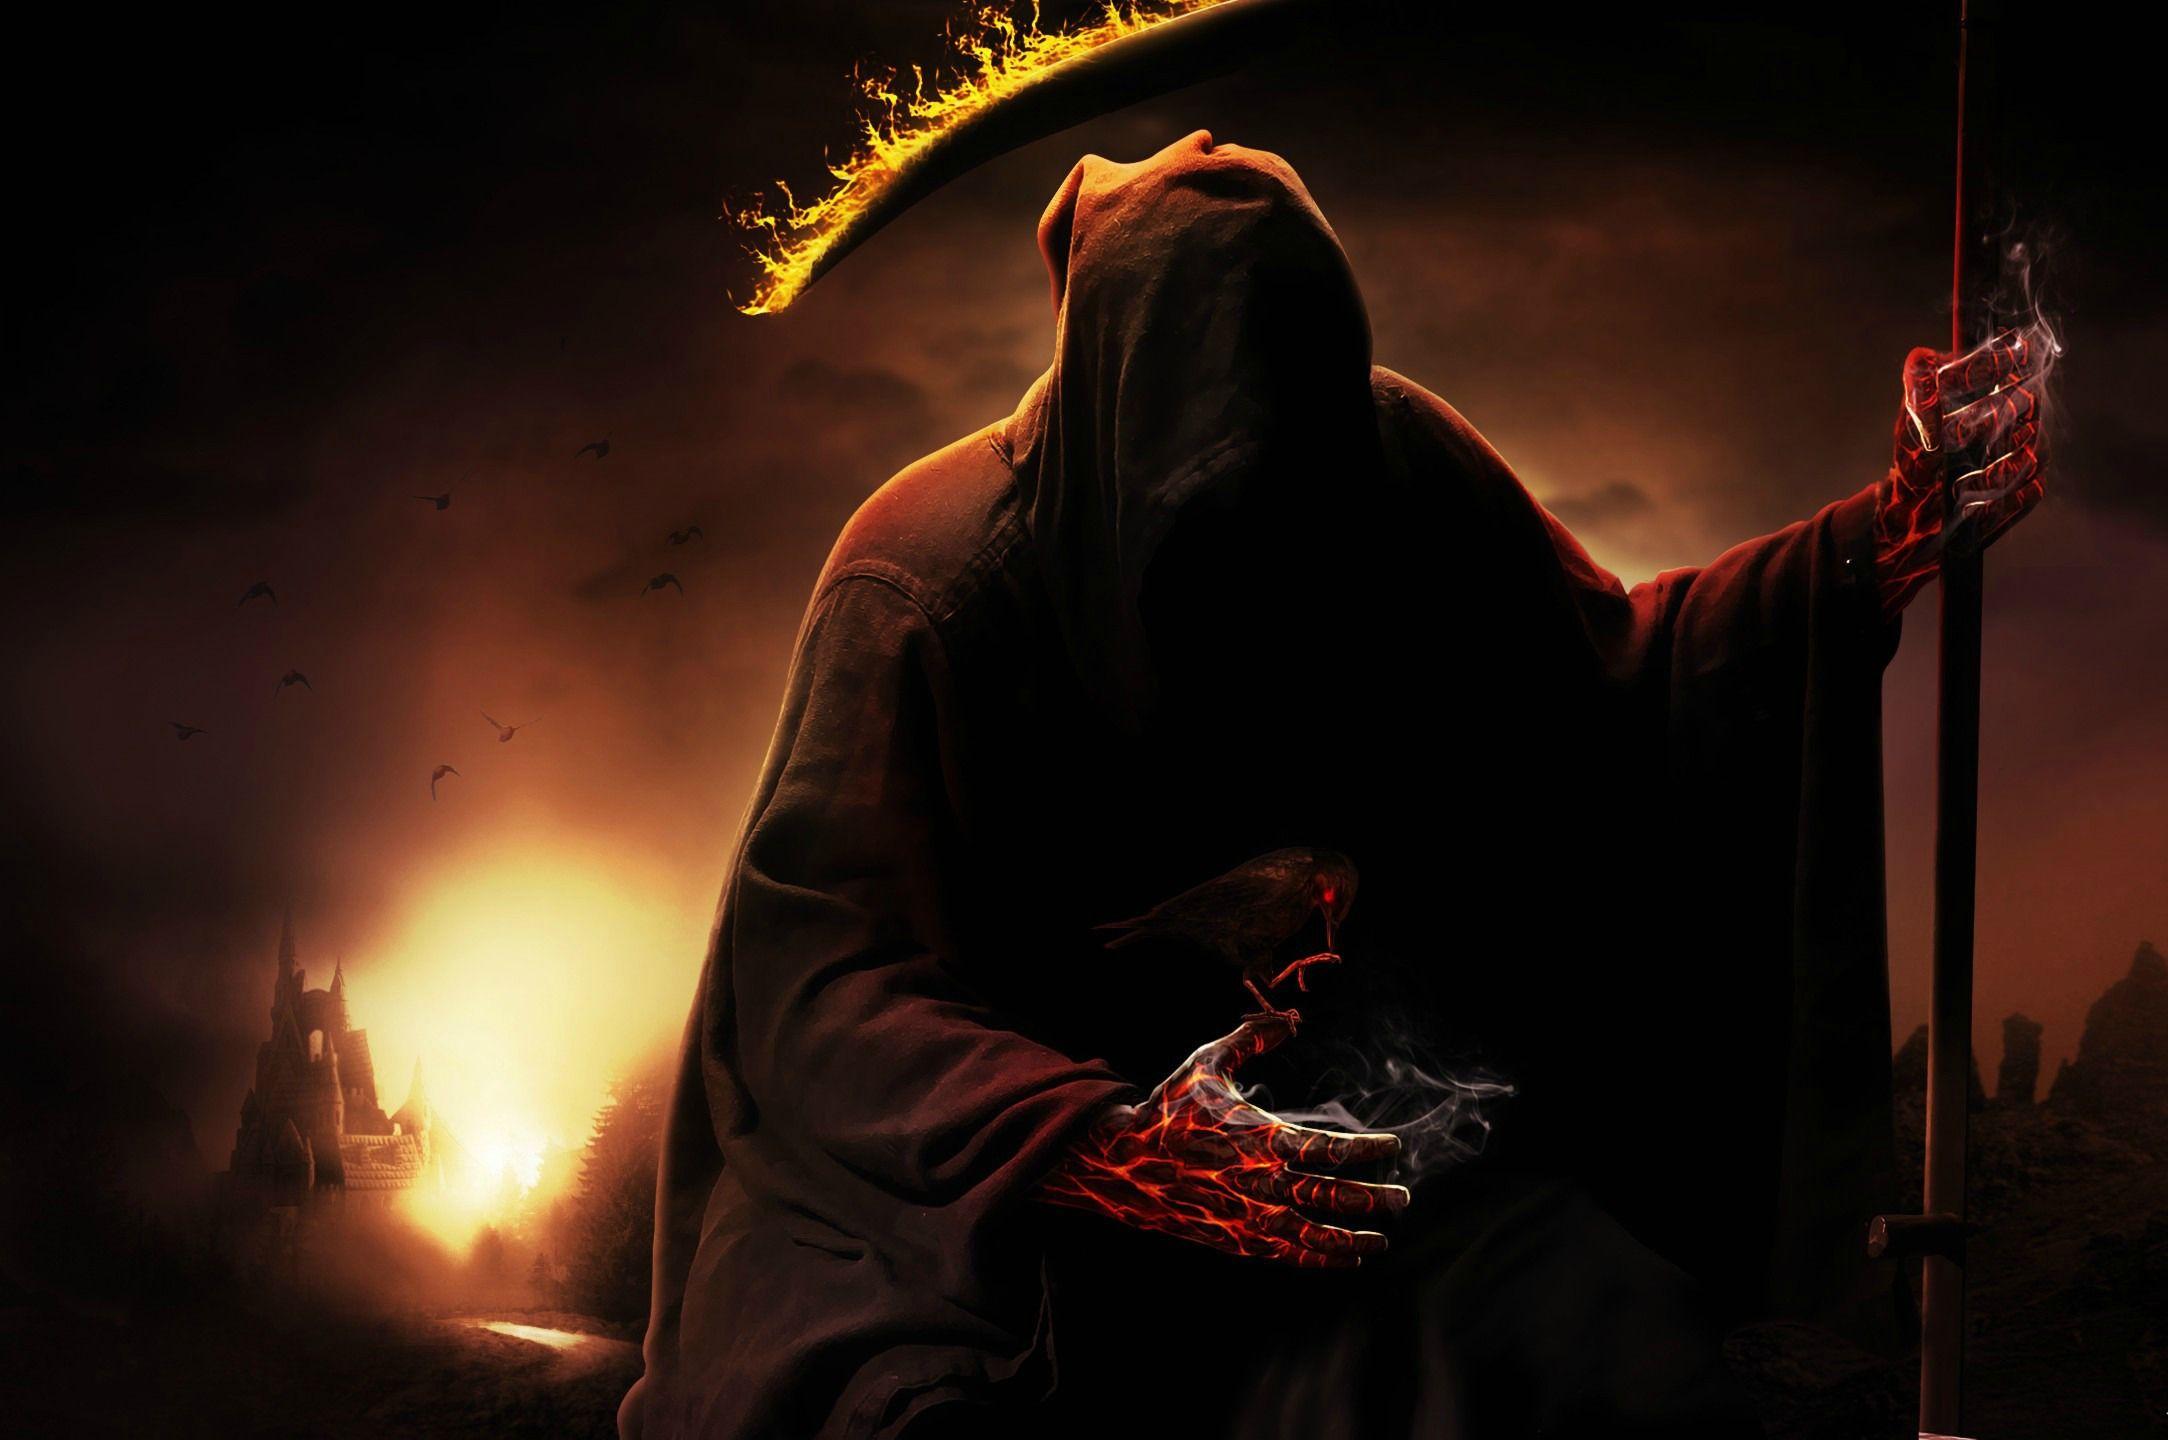 reaper anime wallpaper - photo #40